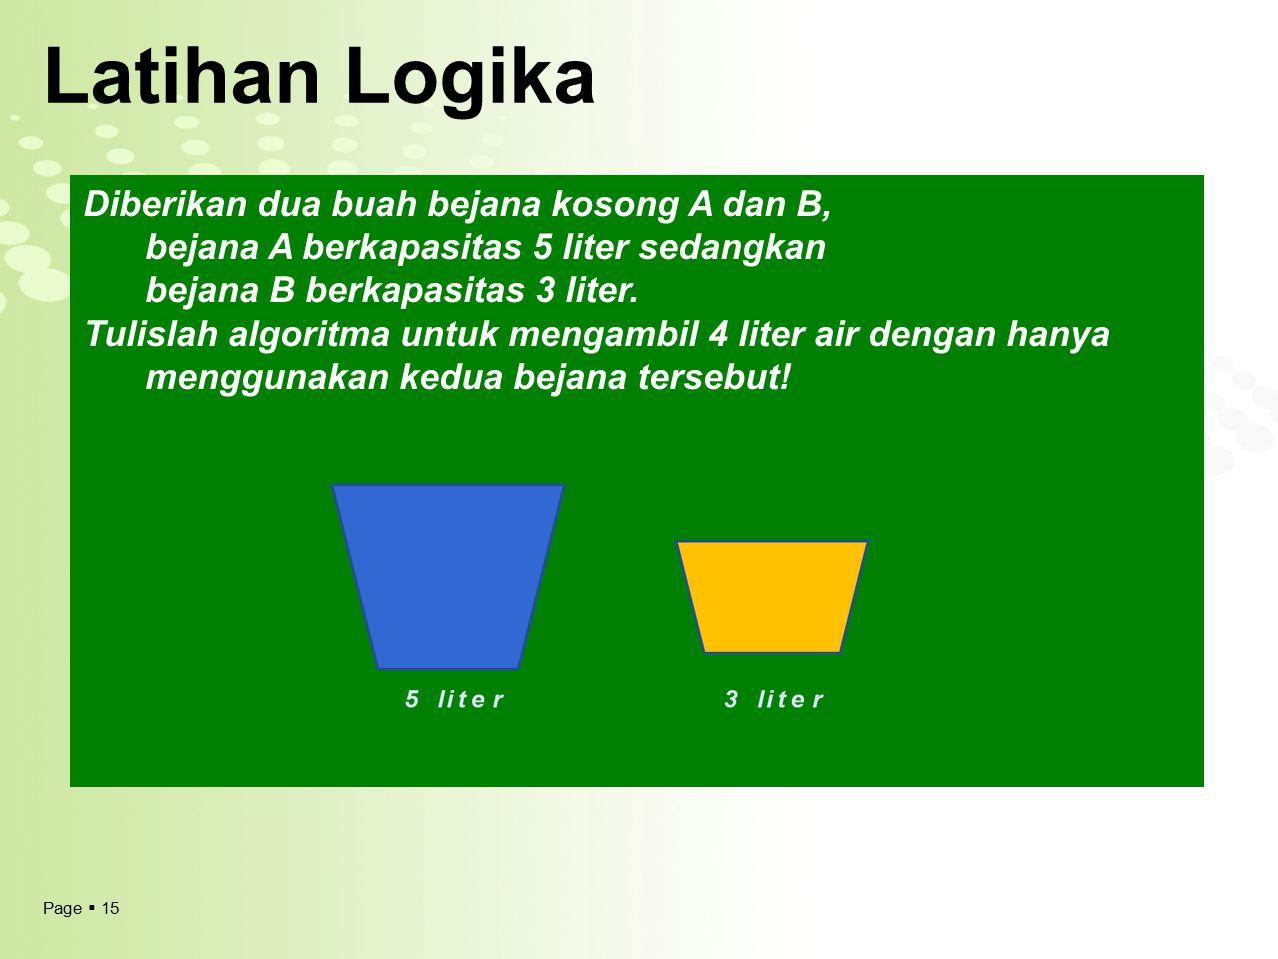 Page  15 Latihan Logika Diberikan dua buah bejana kosong A dan B, bejana A berkapasitas 5 liter sedangkan bejana B berkapasitas 3 liter. Tulislah alg